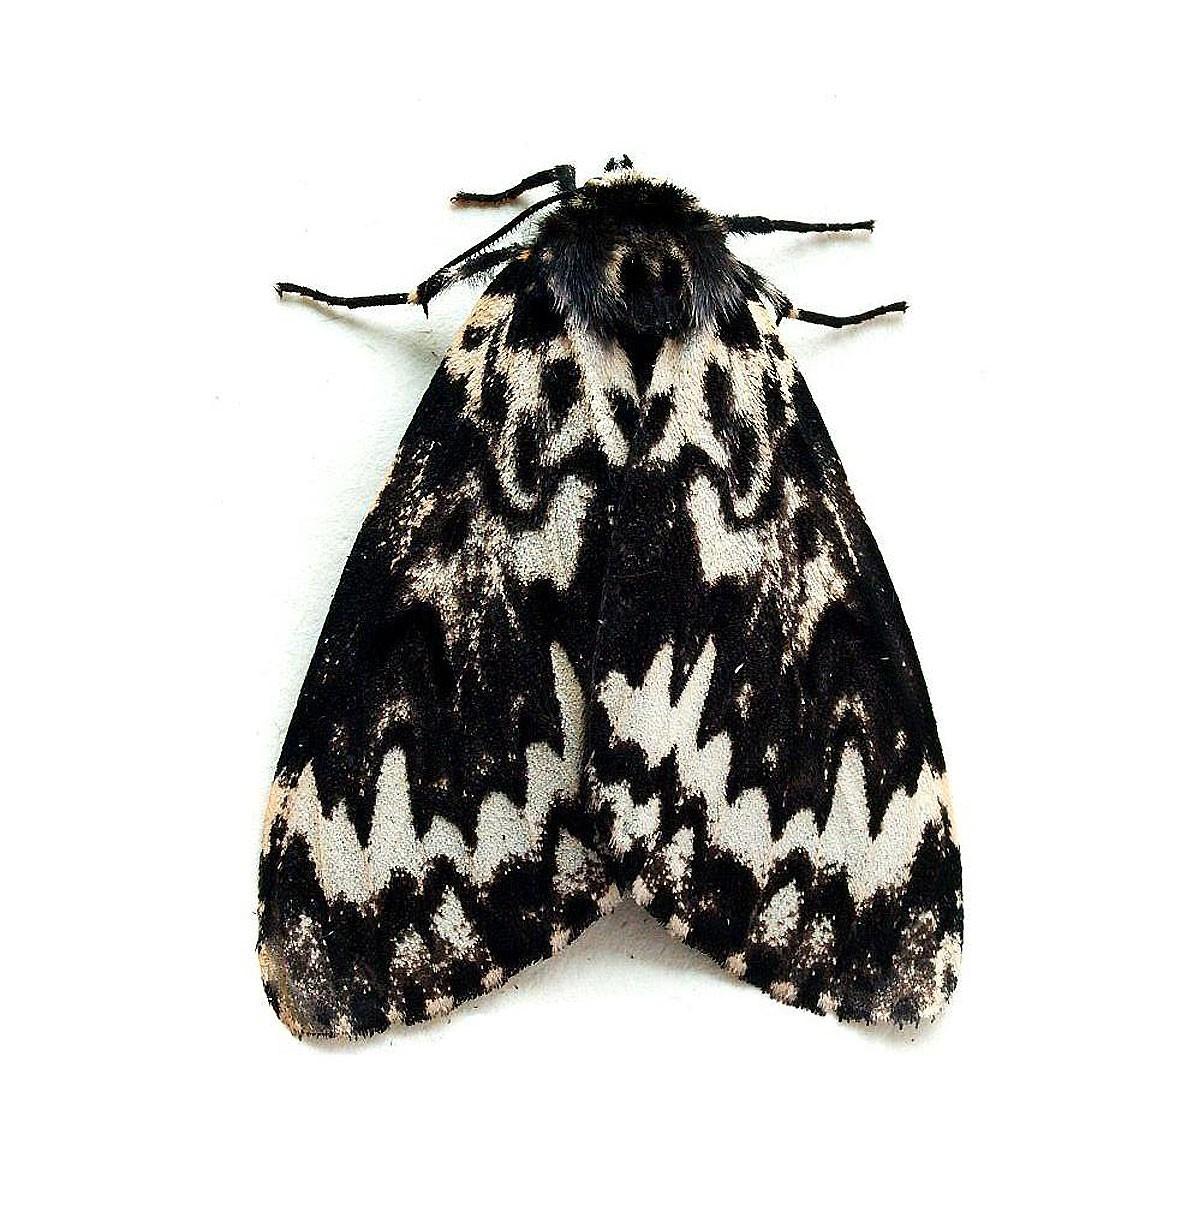 Nonne (Lymantria monacha), Lymowit®